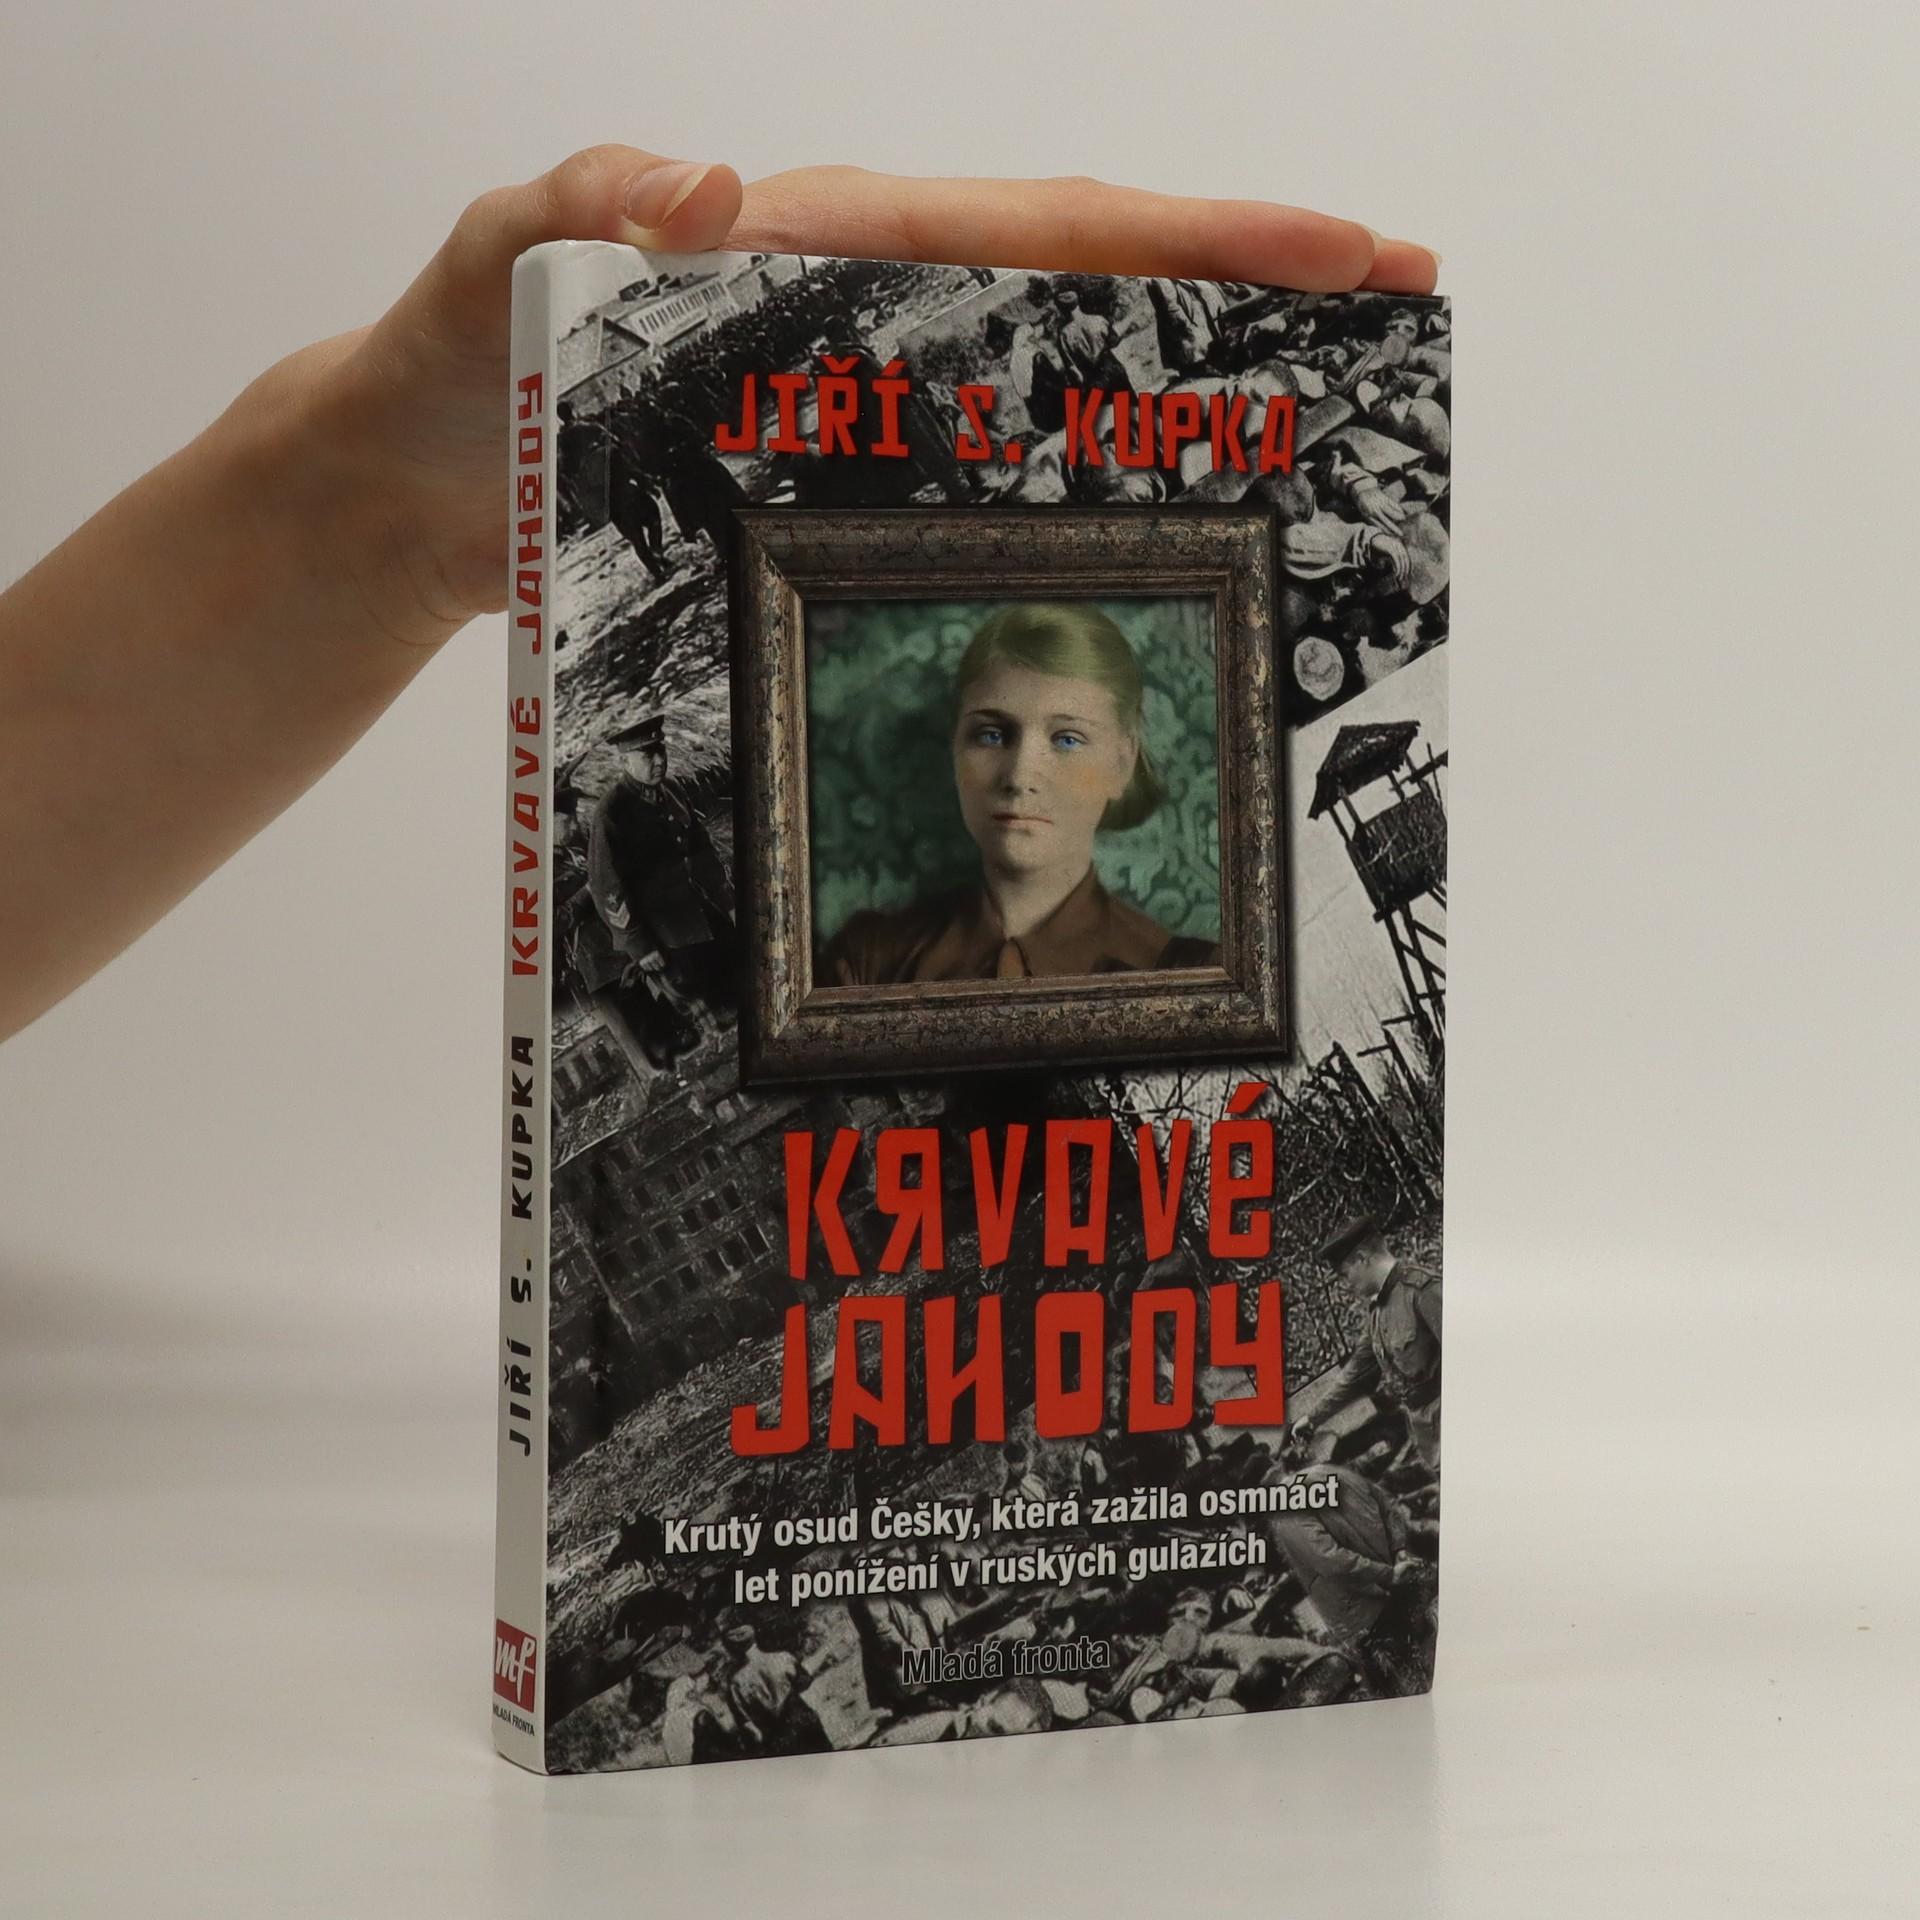 antikvární kniha Krvavé jahody, 2008